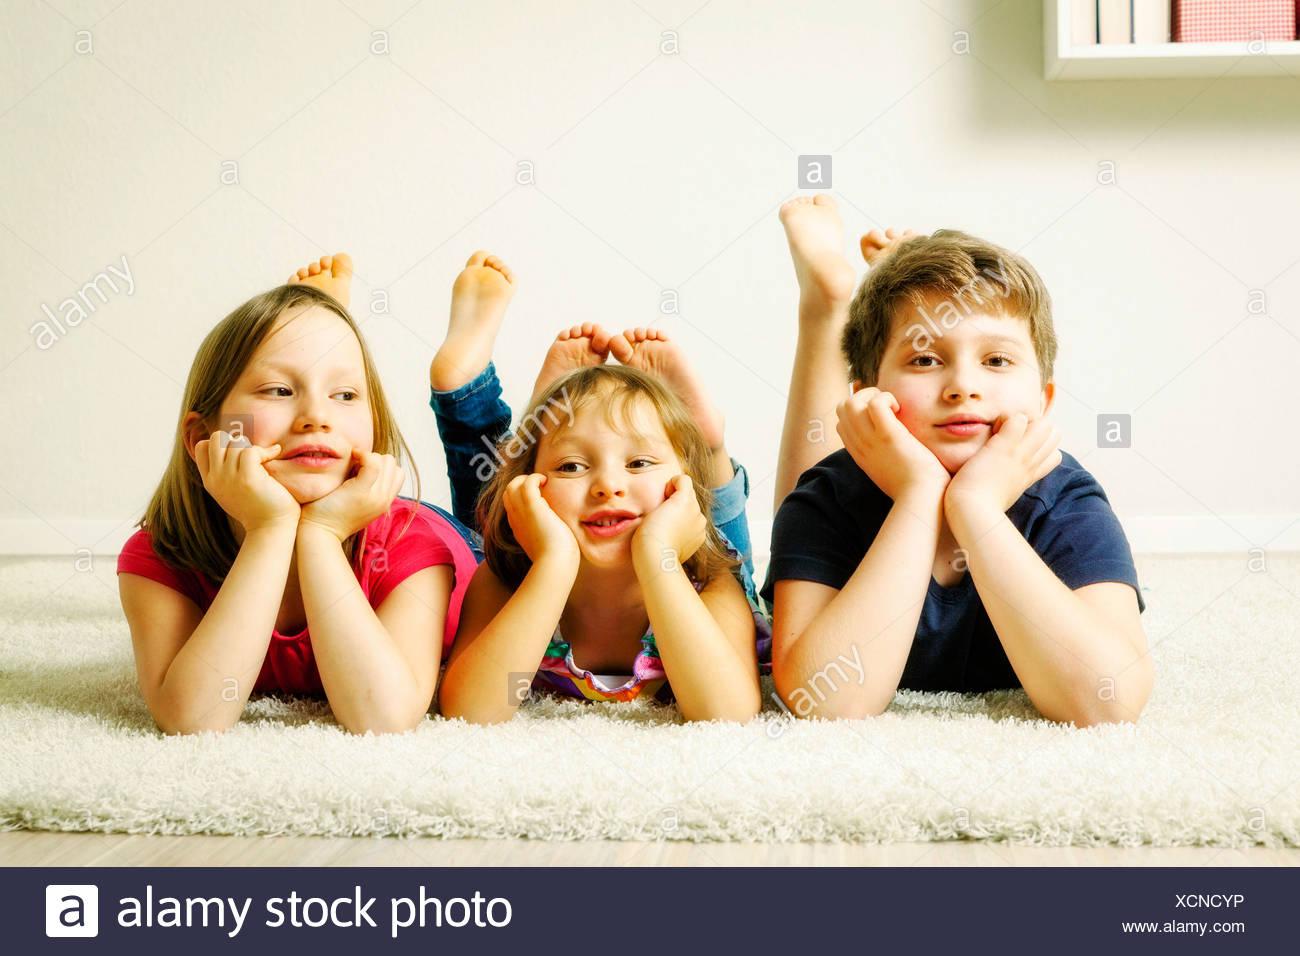 Three children relaxing hand on chin, Munich, Bavaria, Germany - Stock Image